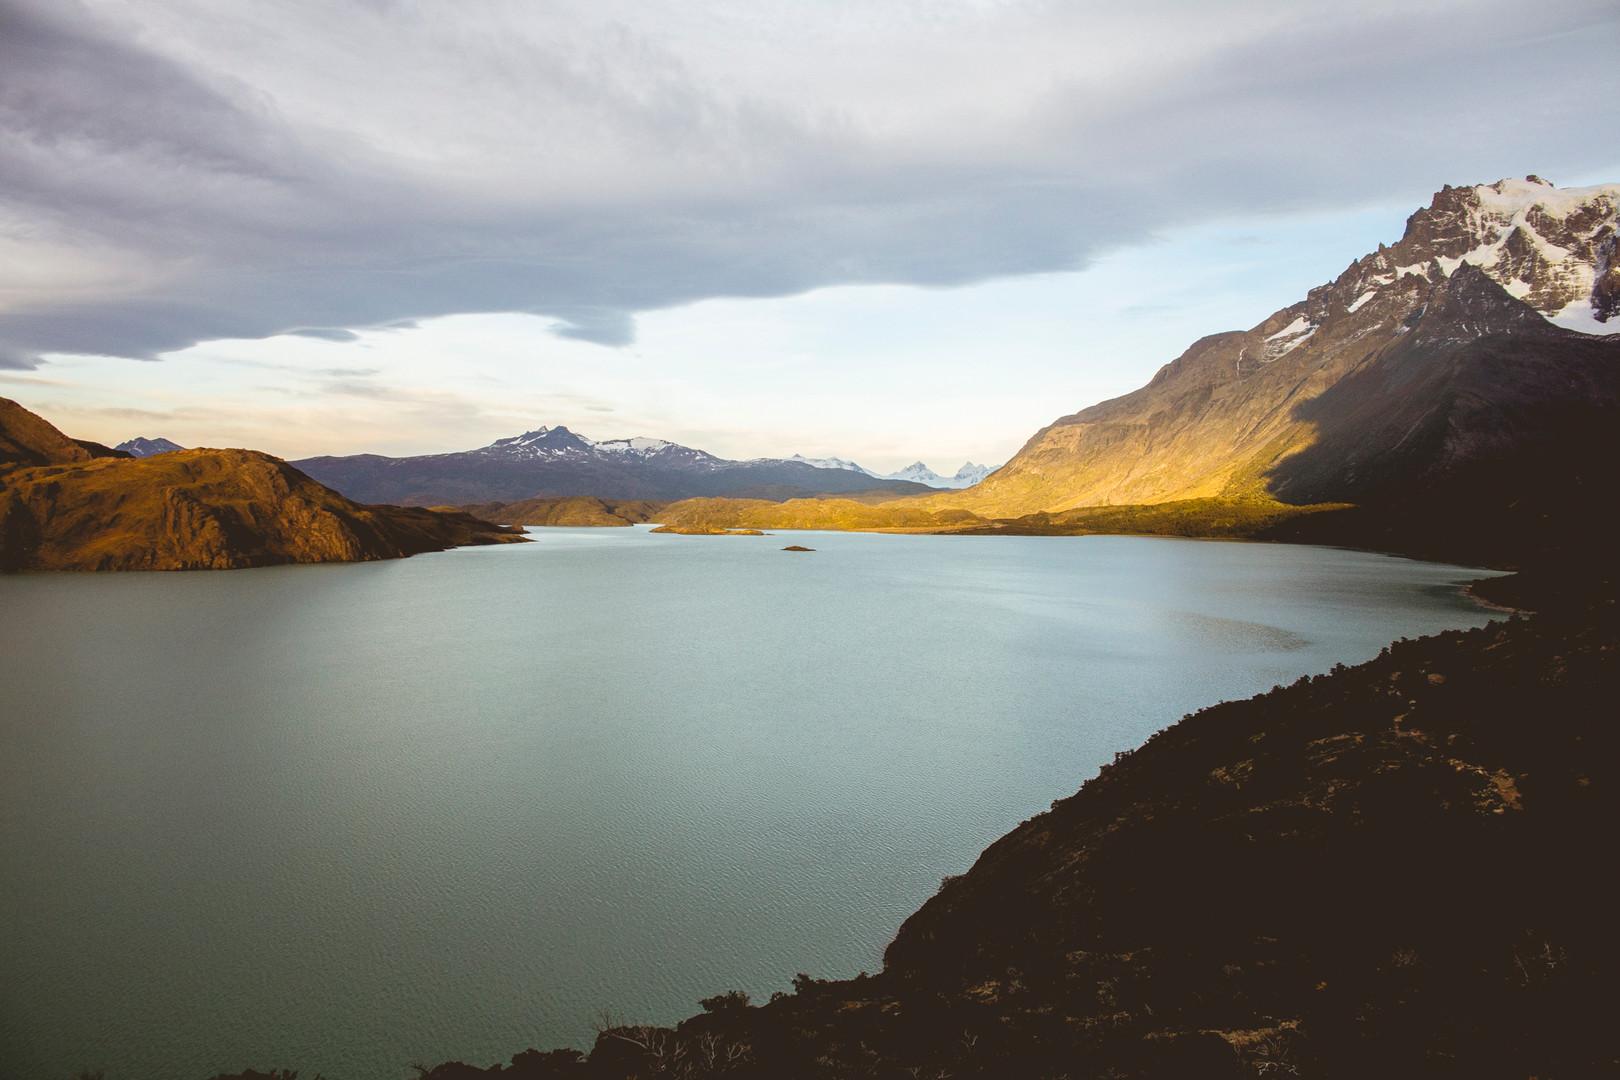 Sunrise in Lake Nordenskjold, Torres del Paine National Park, Chile, April 2016